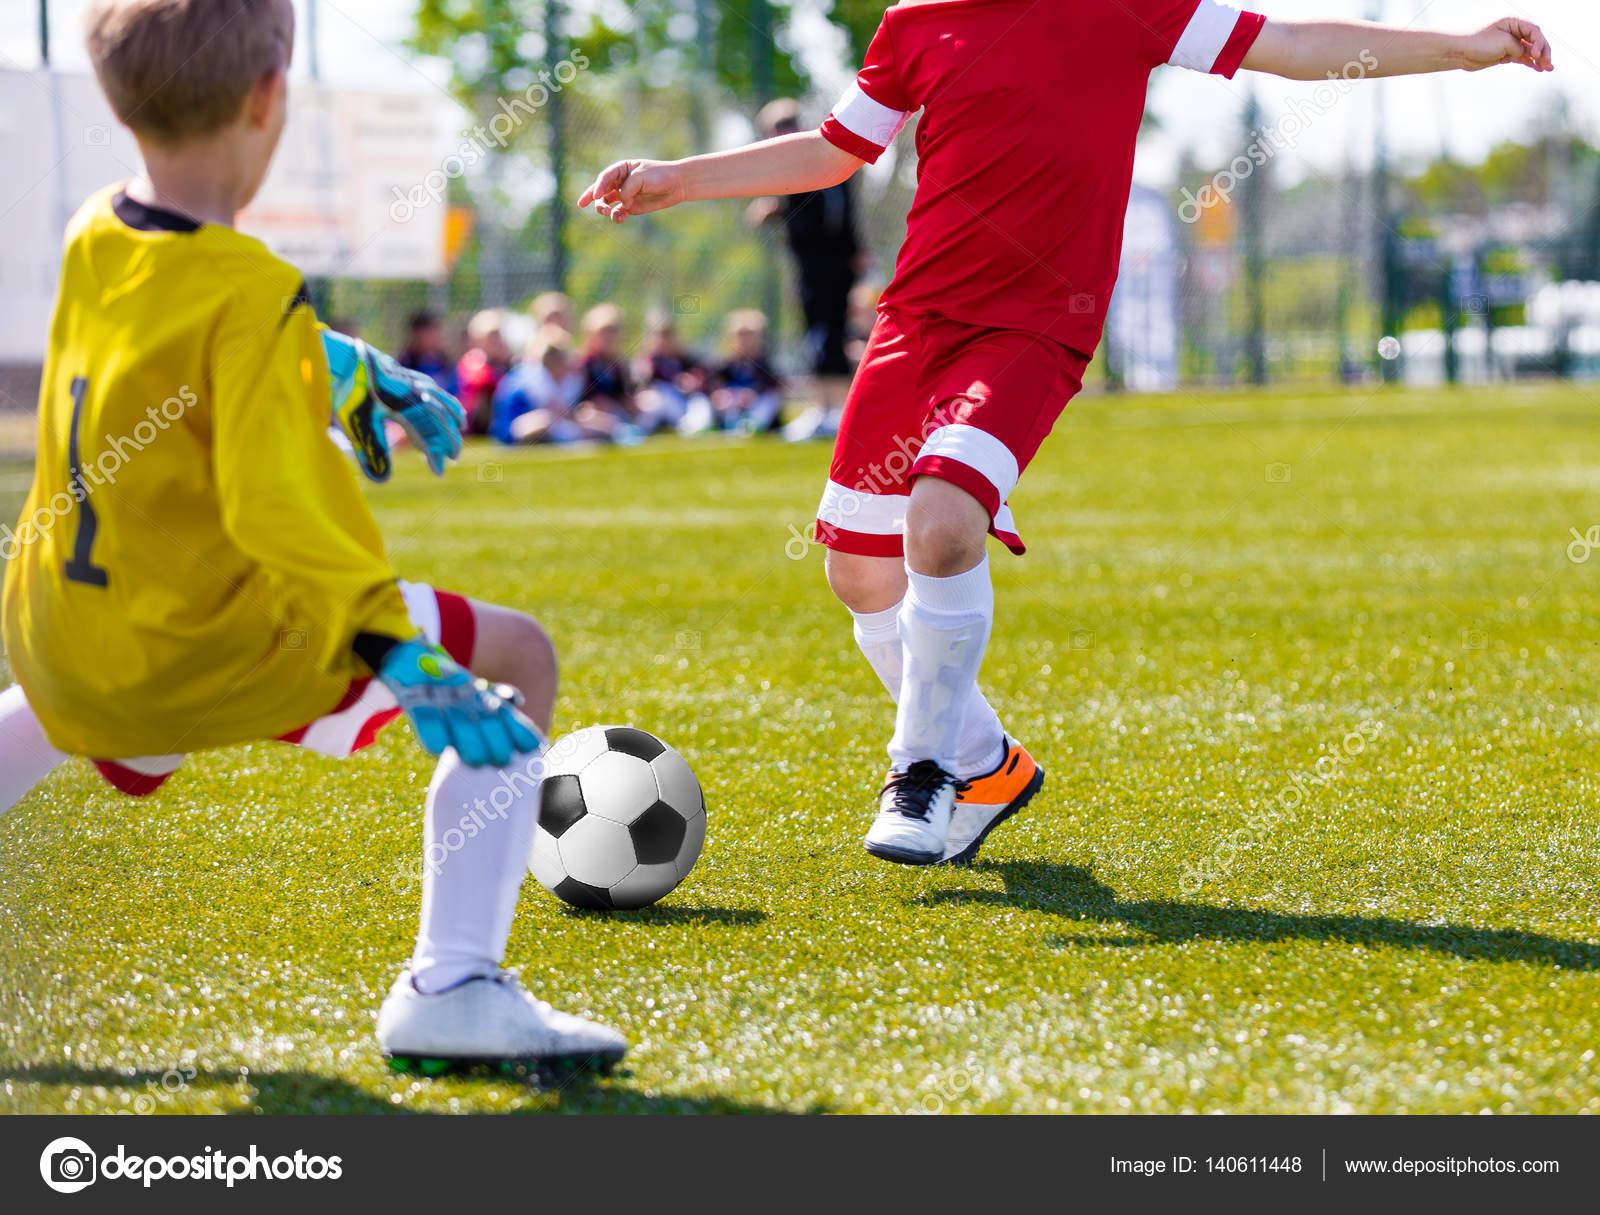 depositphotos 140611448-stock-photo-soccer-goalkeeper-save-running-football.jpg 35e6896b77f